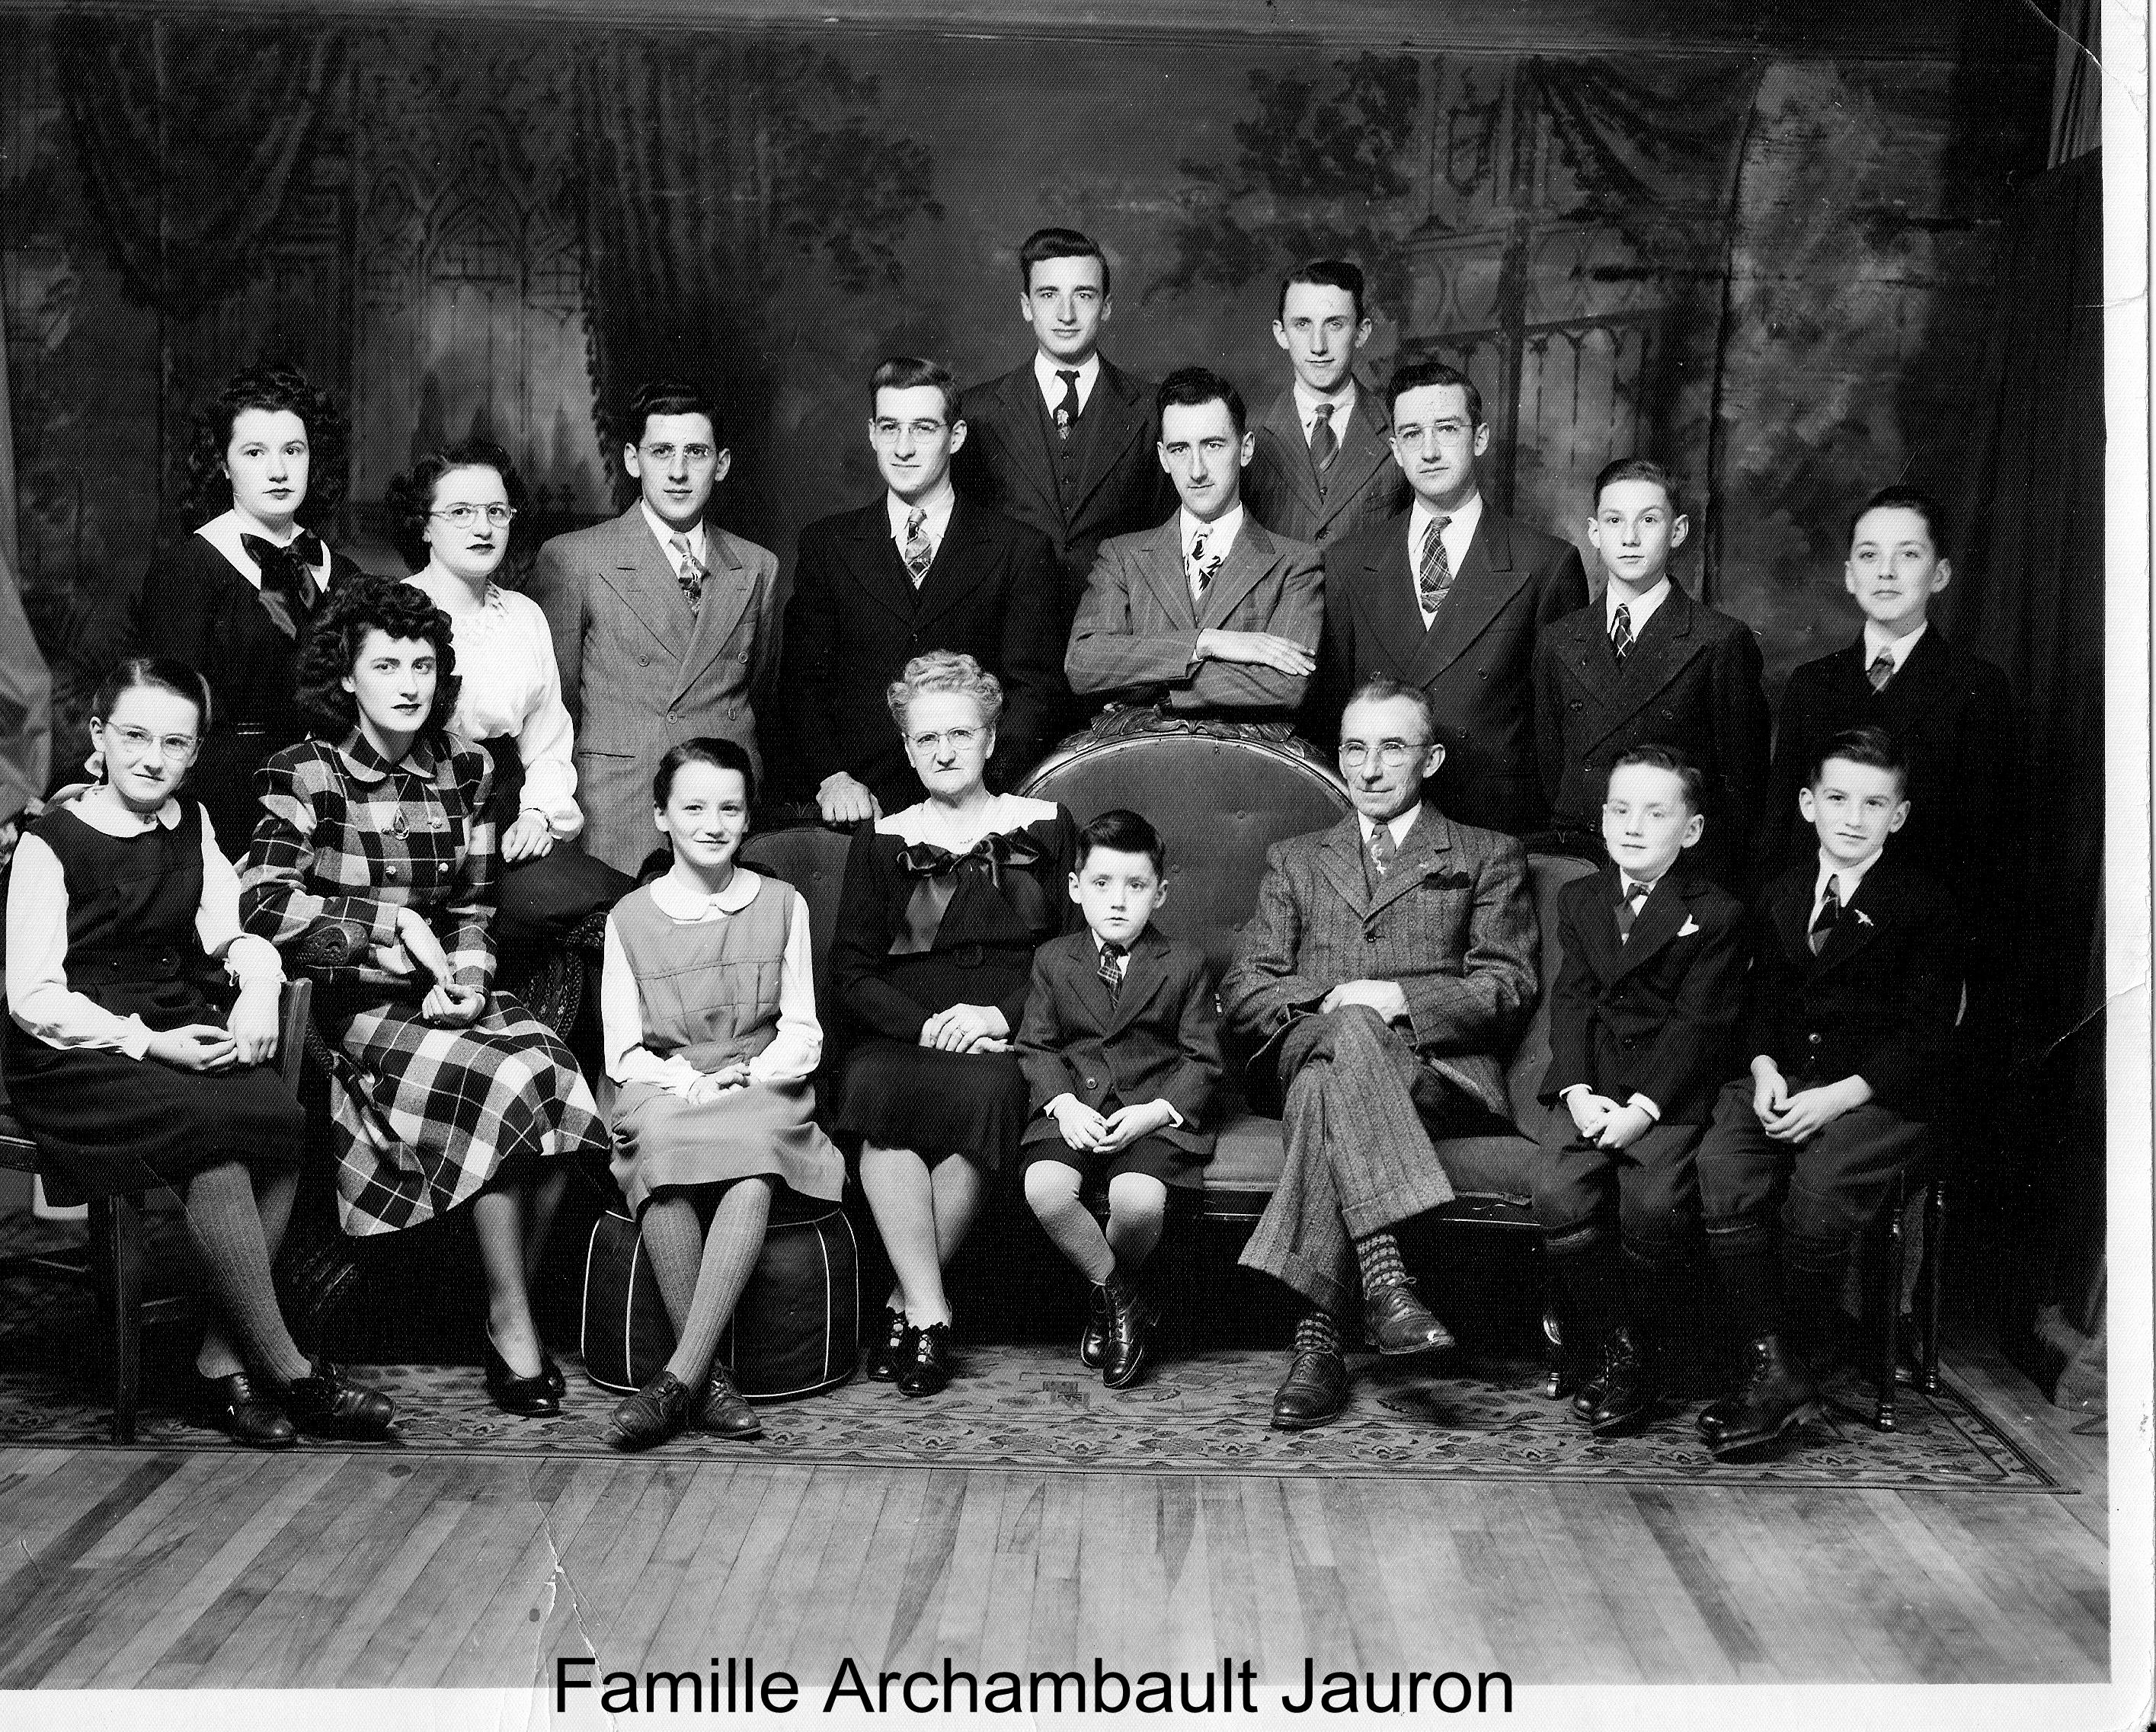 Famille Archambault Jauron